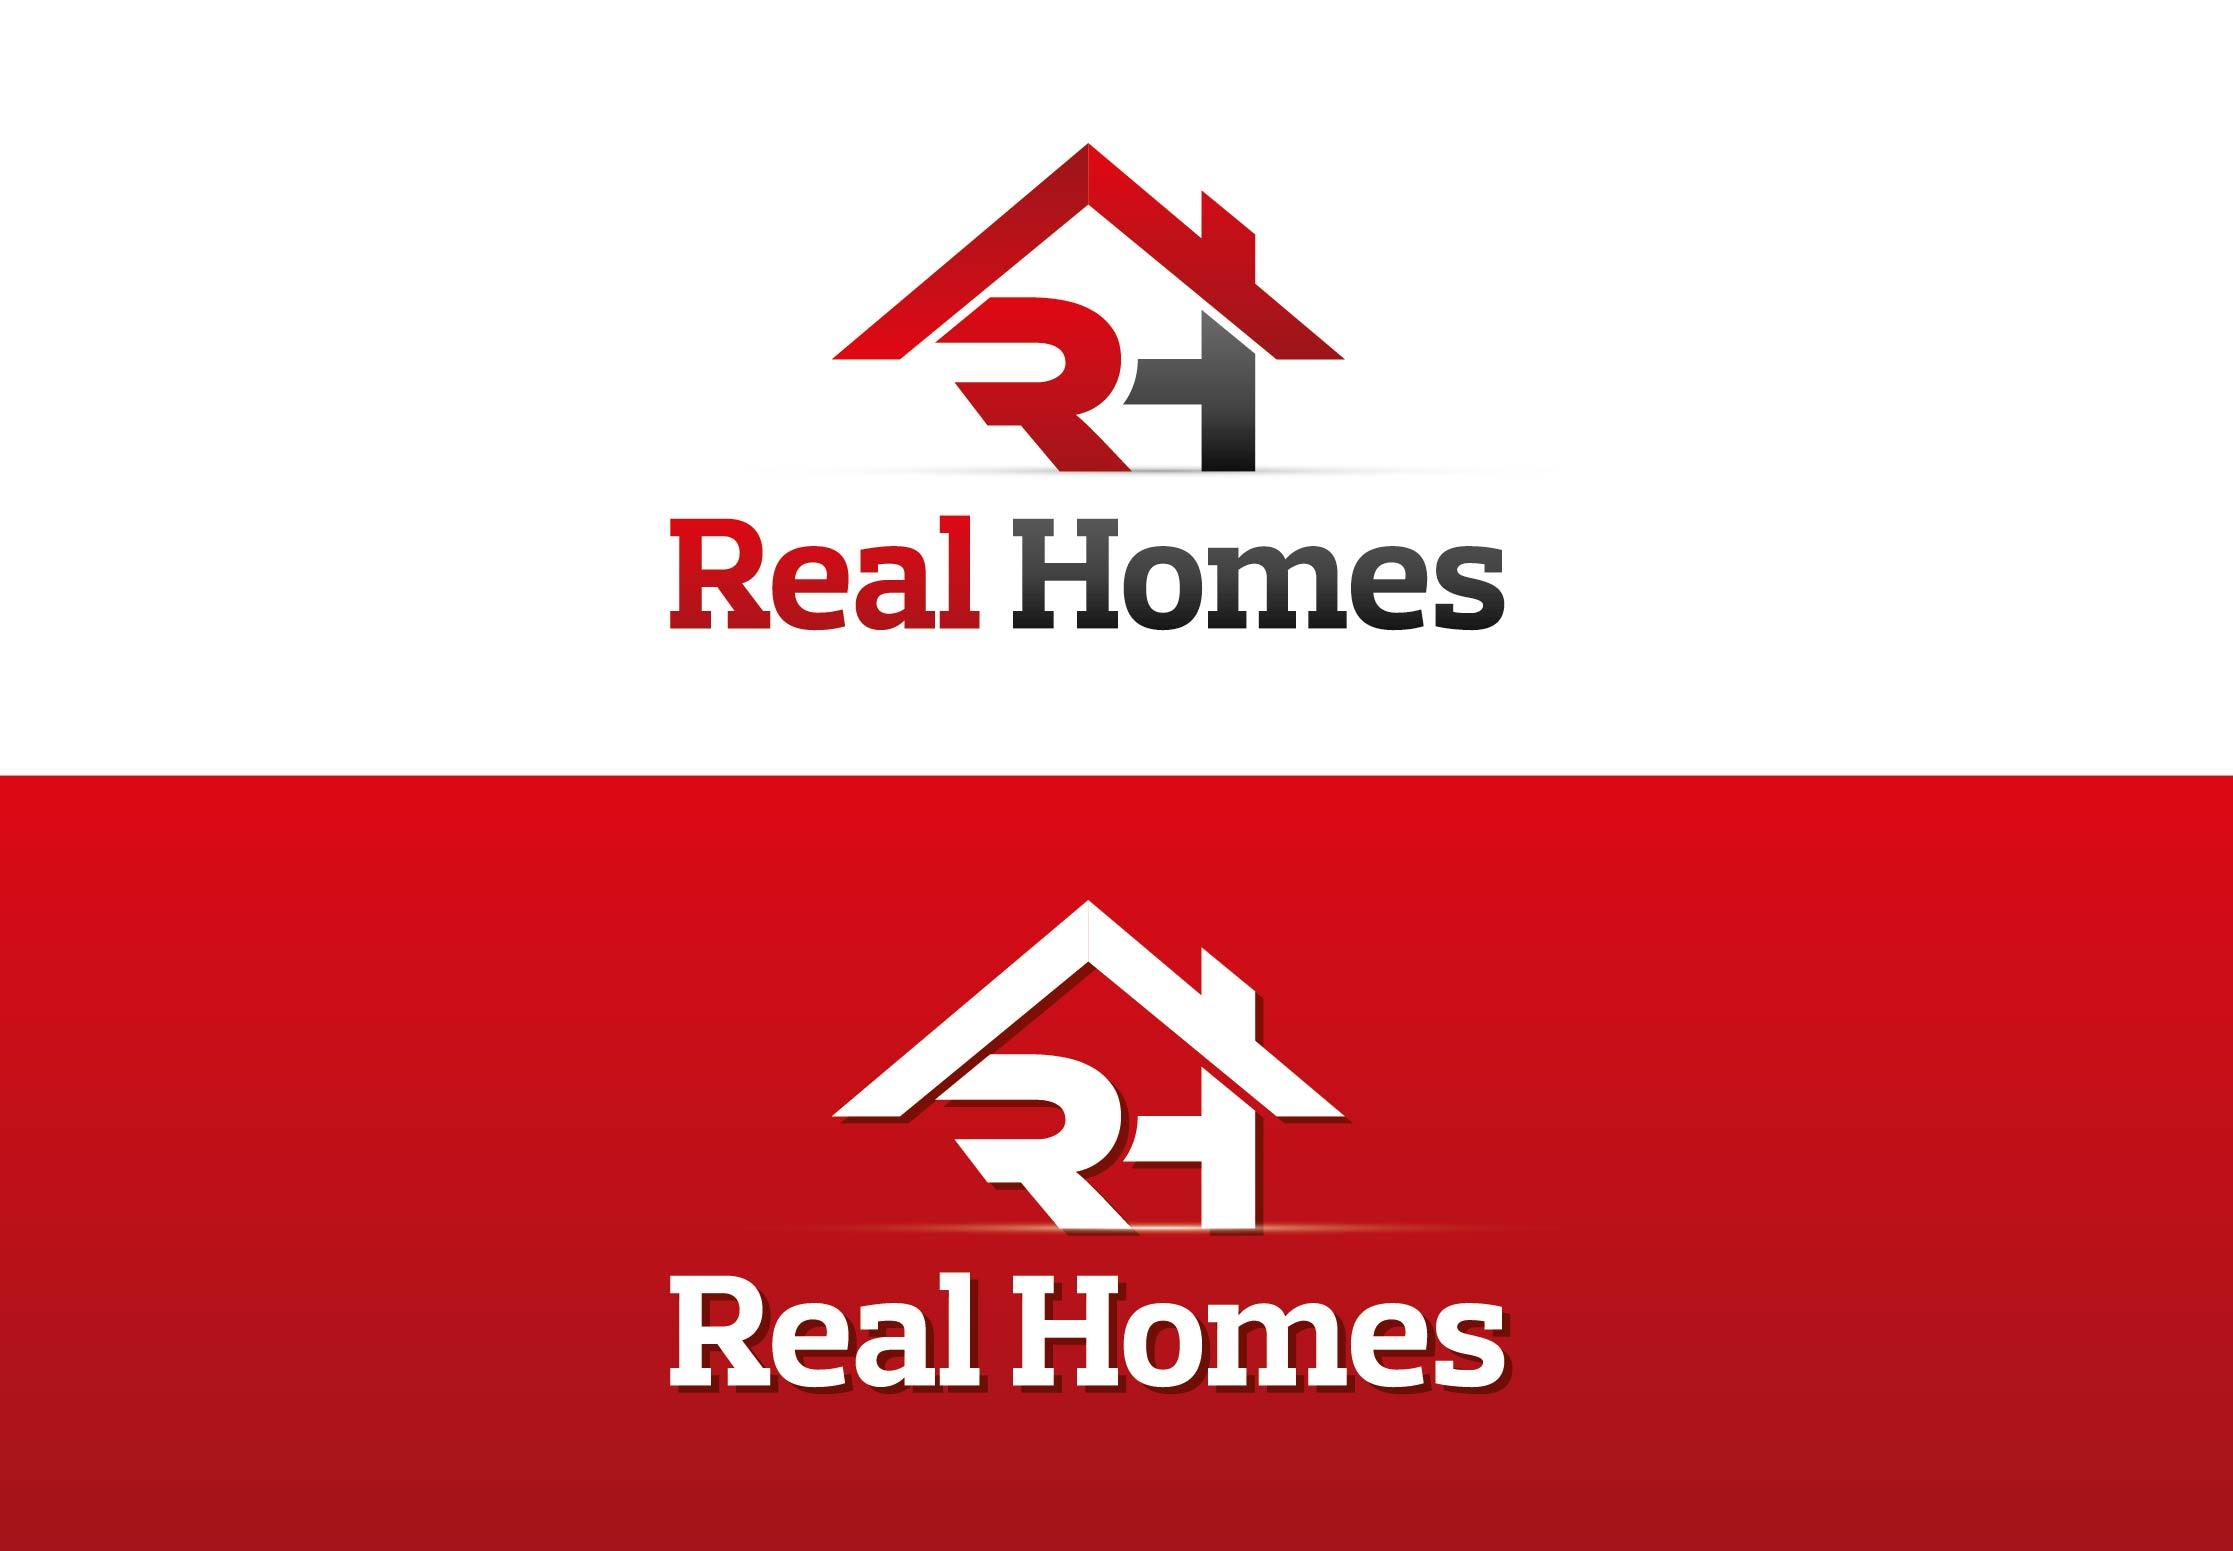 Logo Design by Adnan Taqi - Entry No. 230 in the Logo Design Contest Captivating Logo Design for Real Homes.